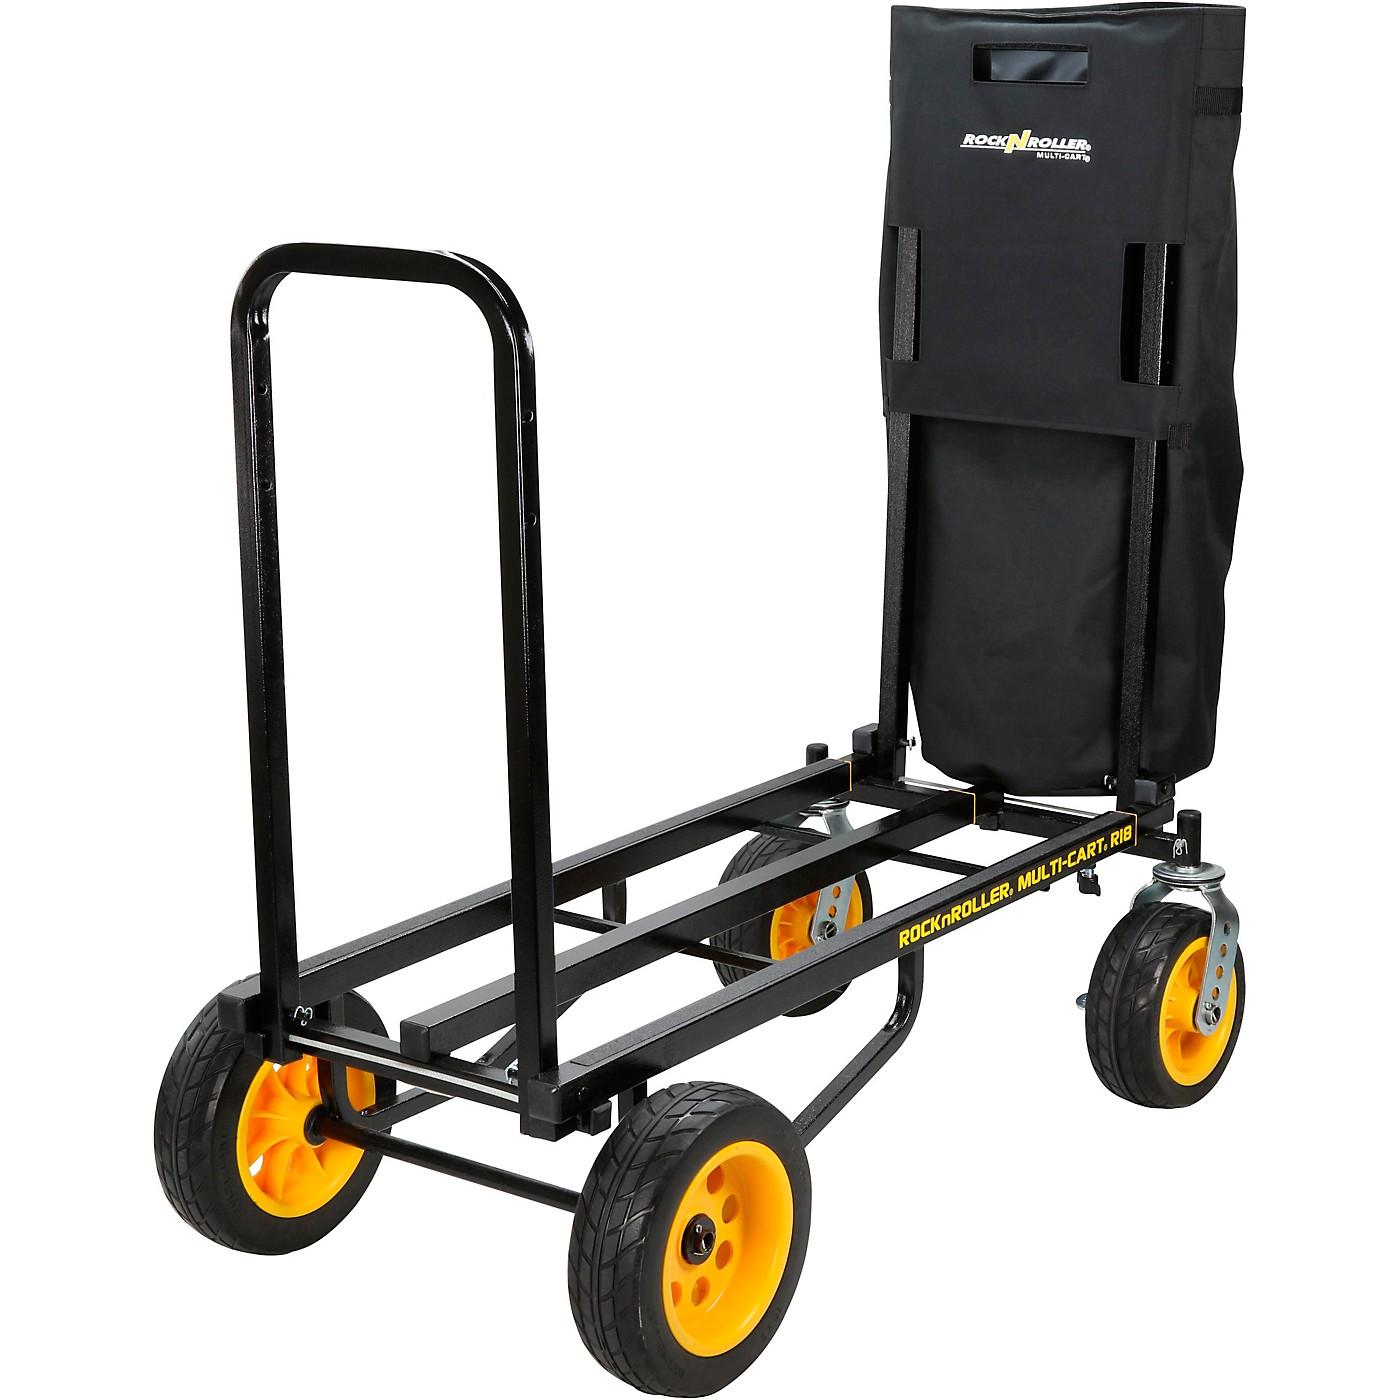 Rock N Roller RSA-HBR14 Handle Bag With Rigid Bottom (Fits R14, R16, R18 Carts) thumbnail